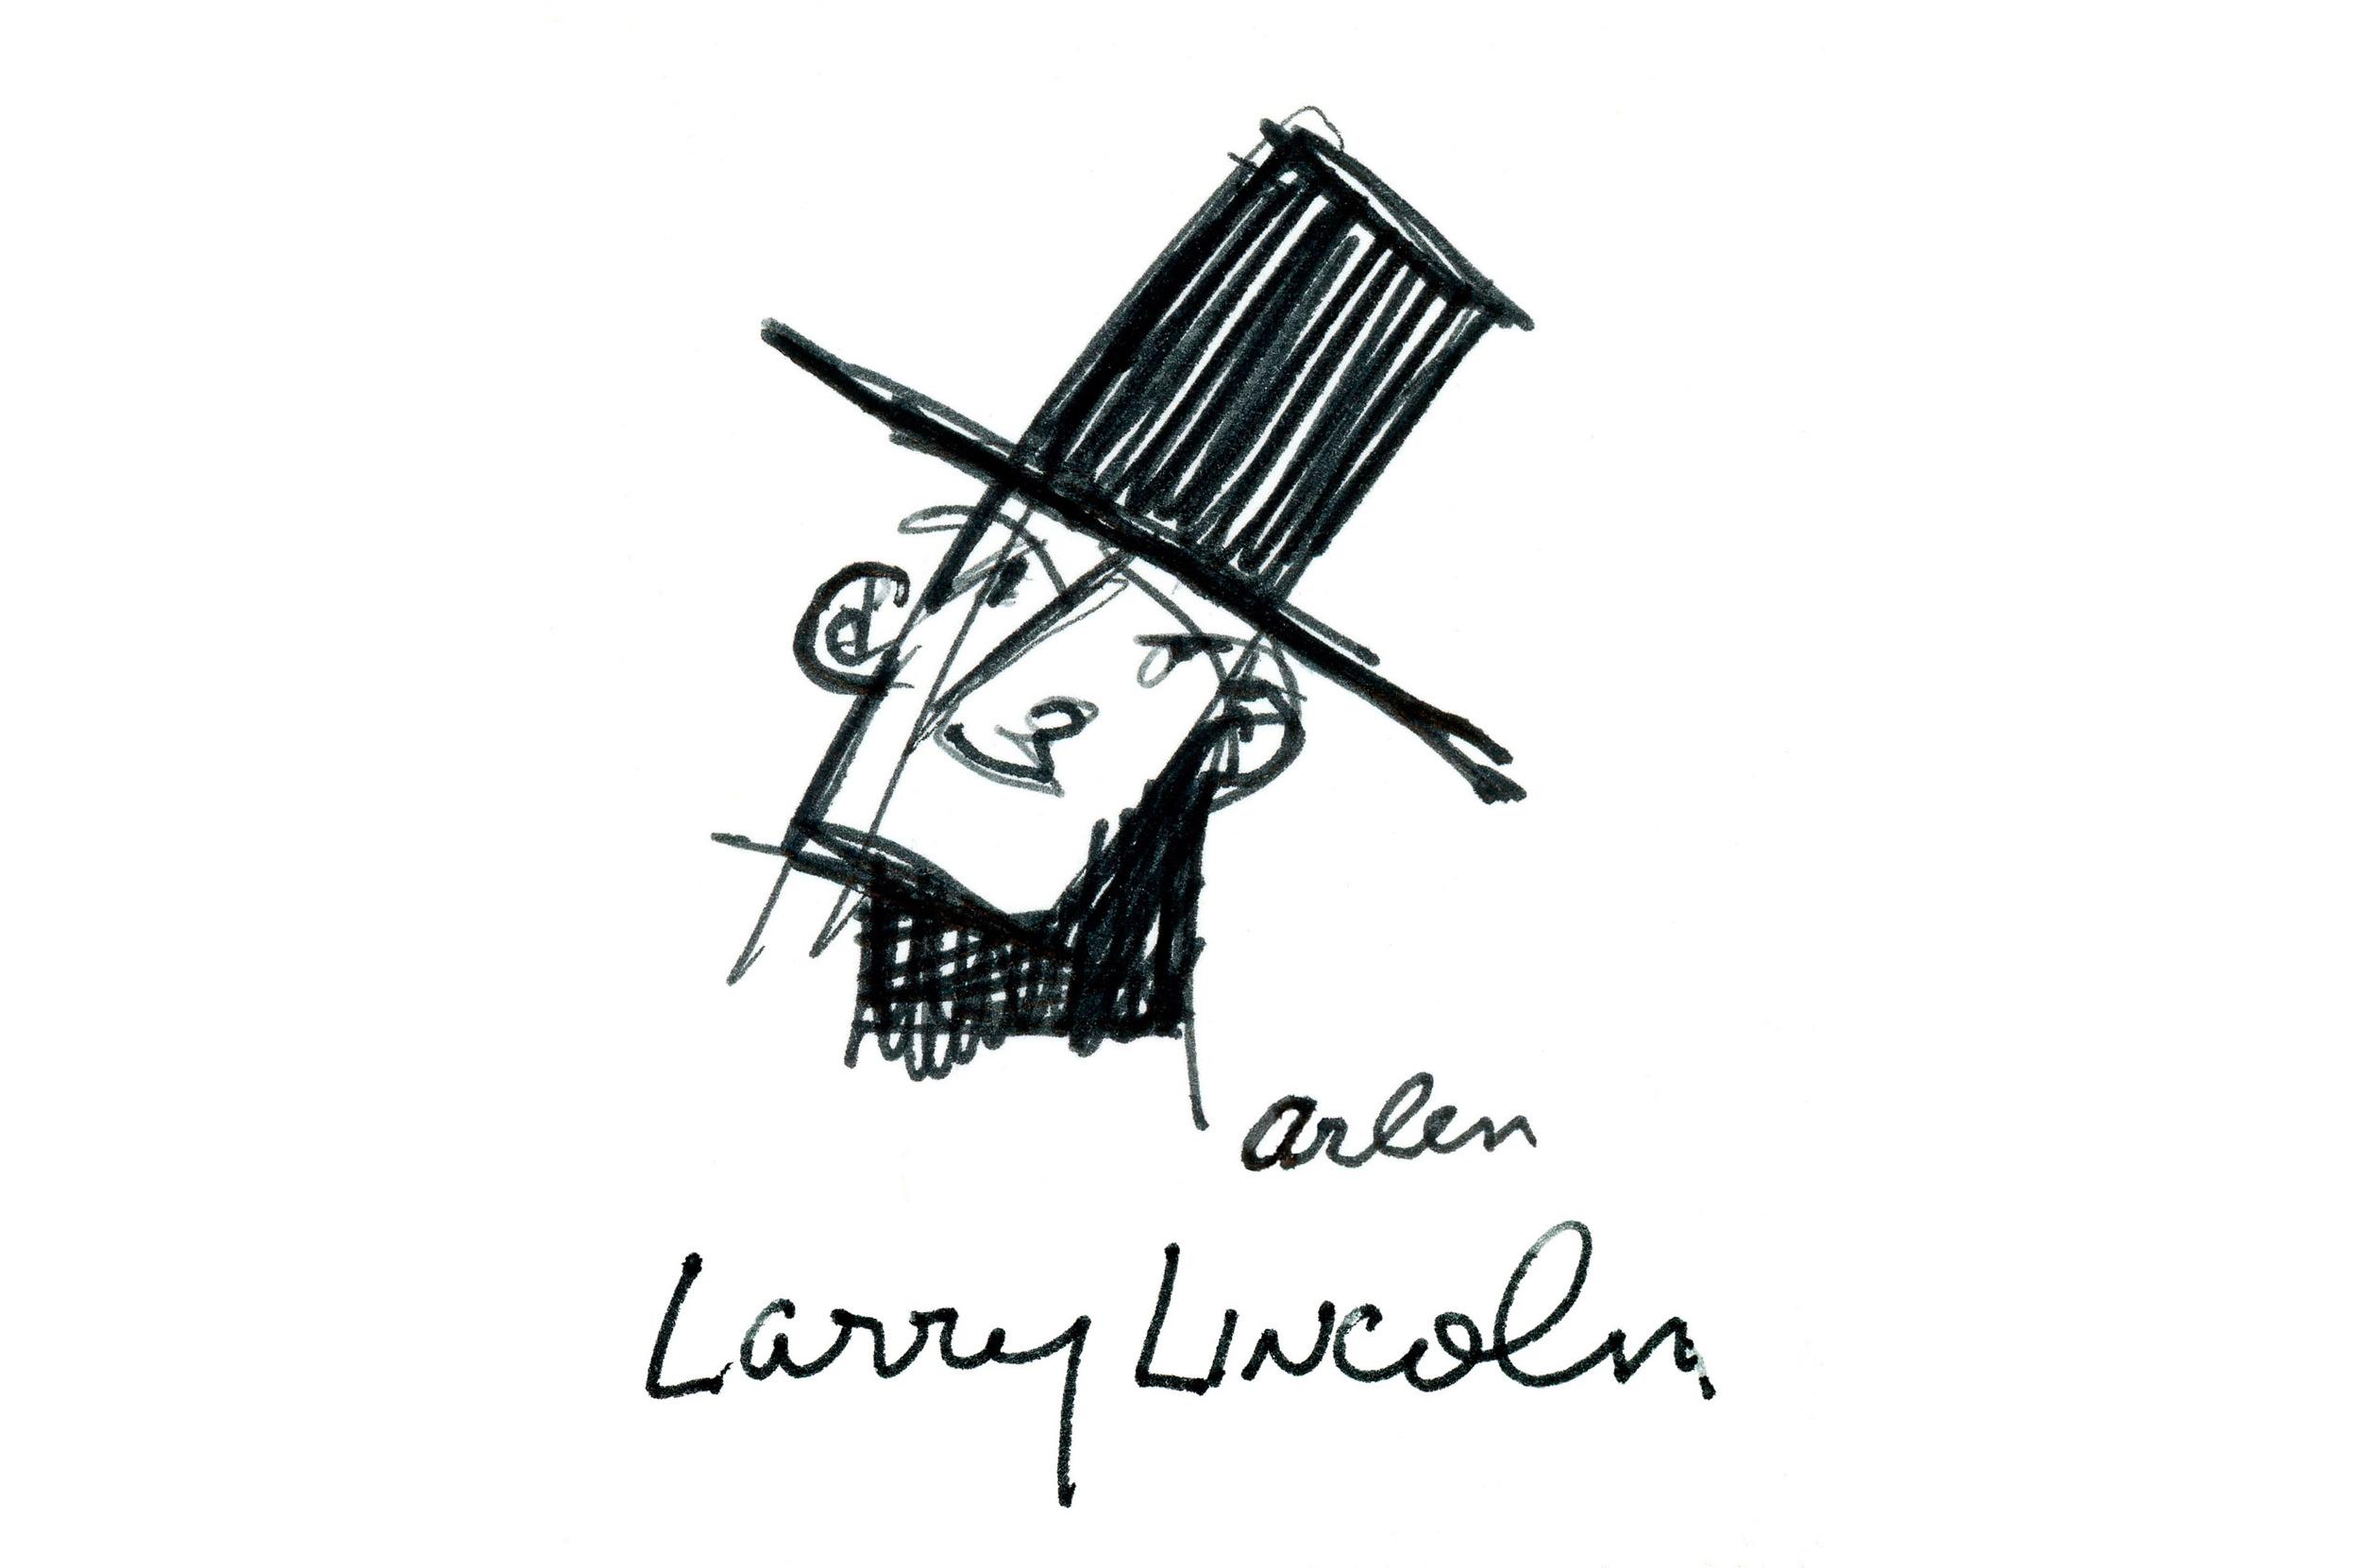 gllry_44-Larry-Lincoln_same-sz.jpg